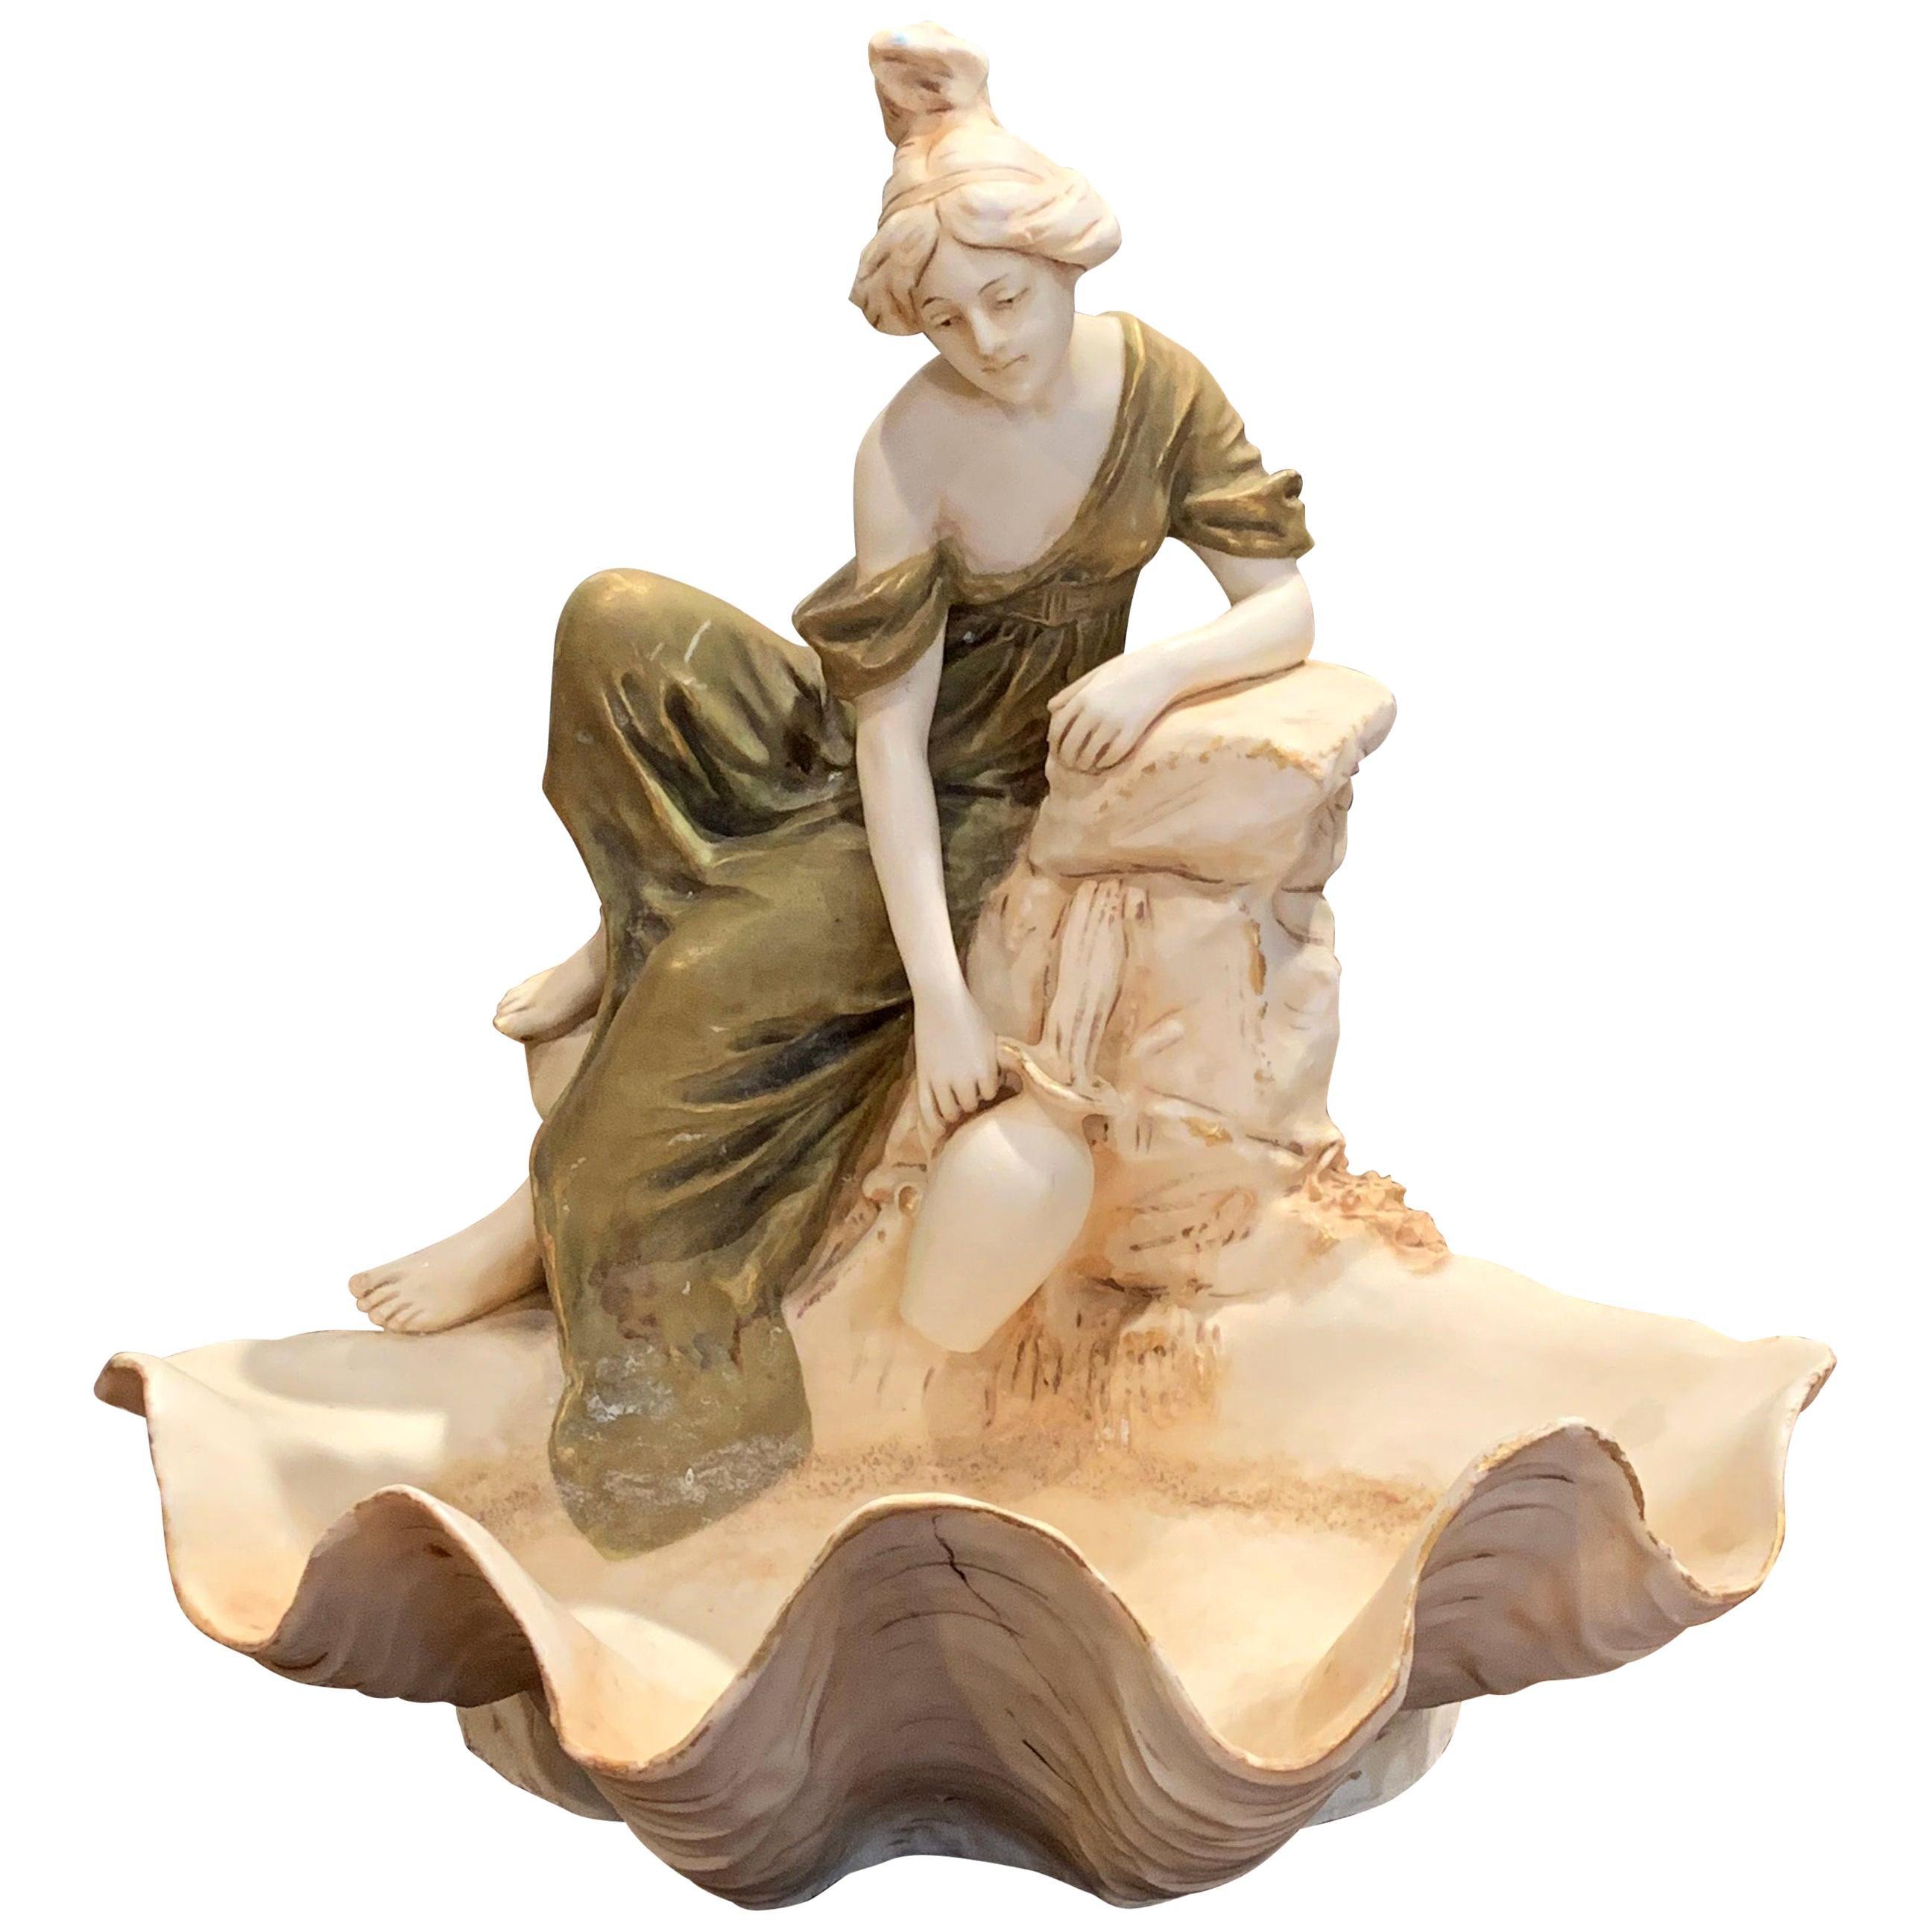 Early 20th Century Czech Royal Dux Bohemian Carved Porcelain Woman Sculpture